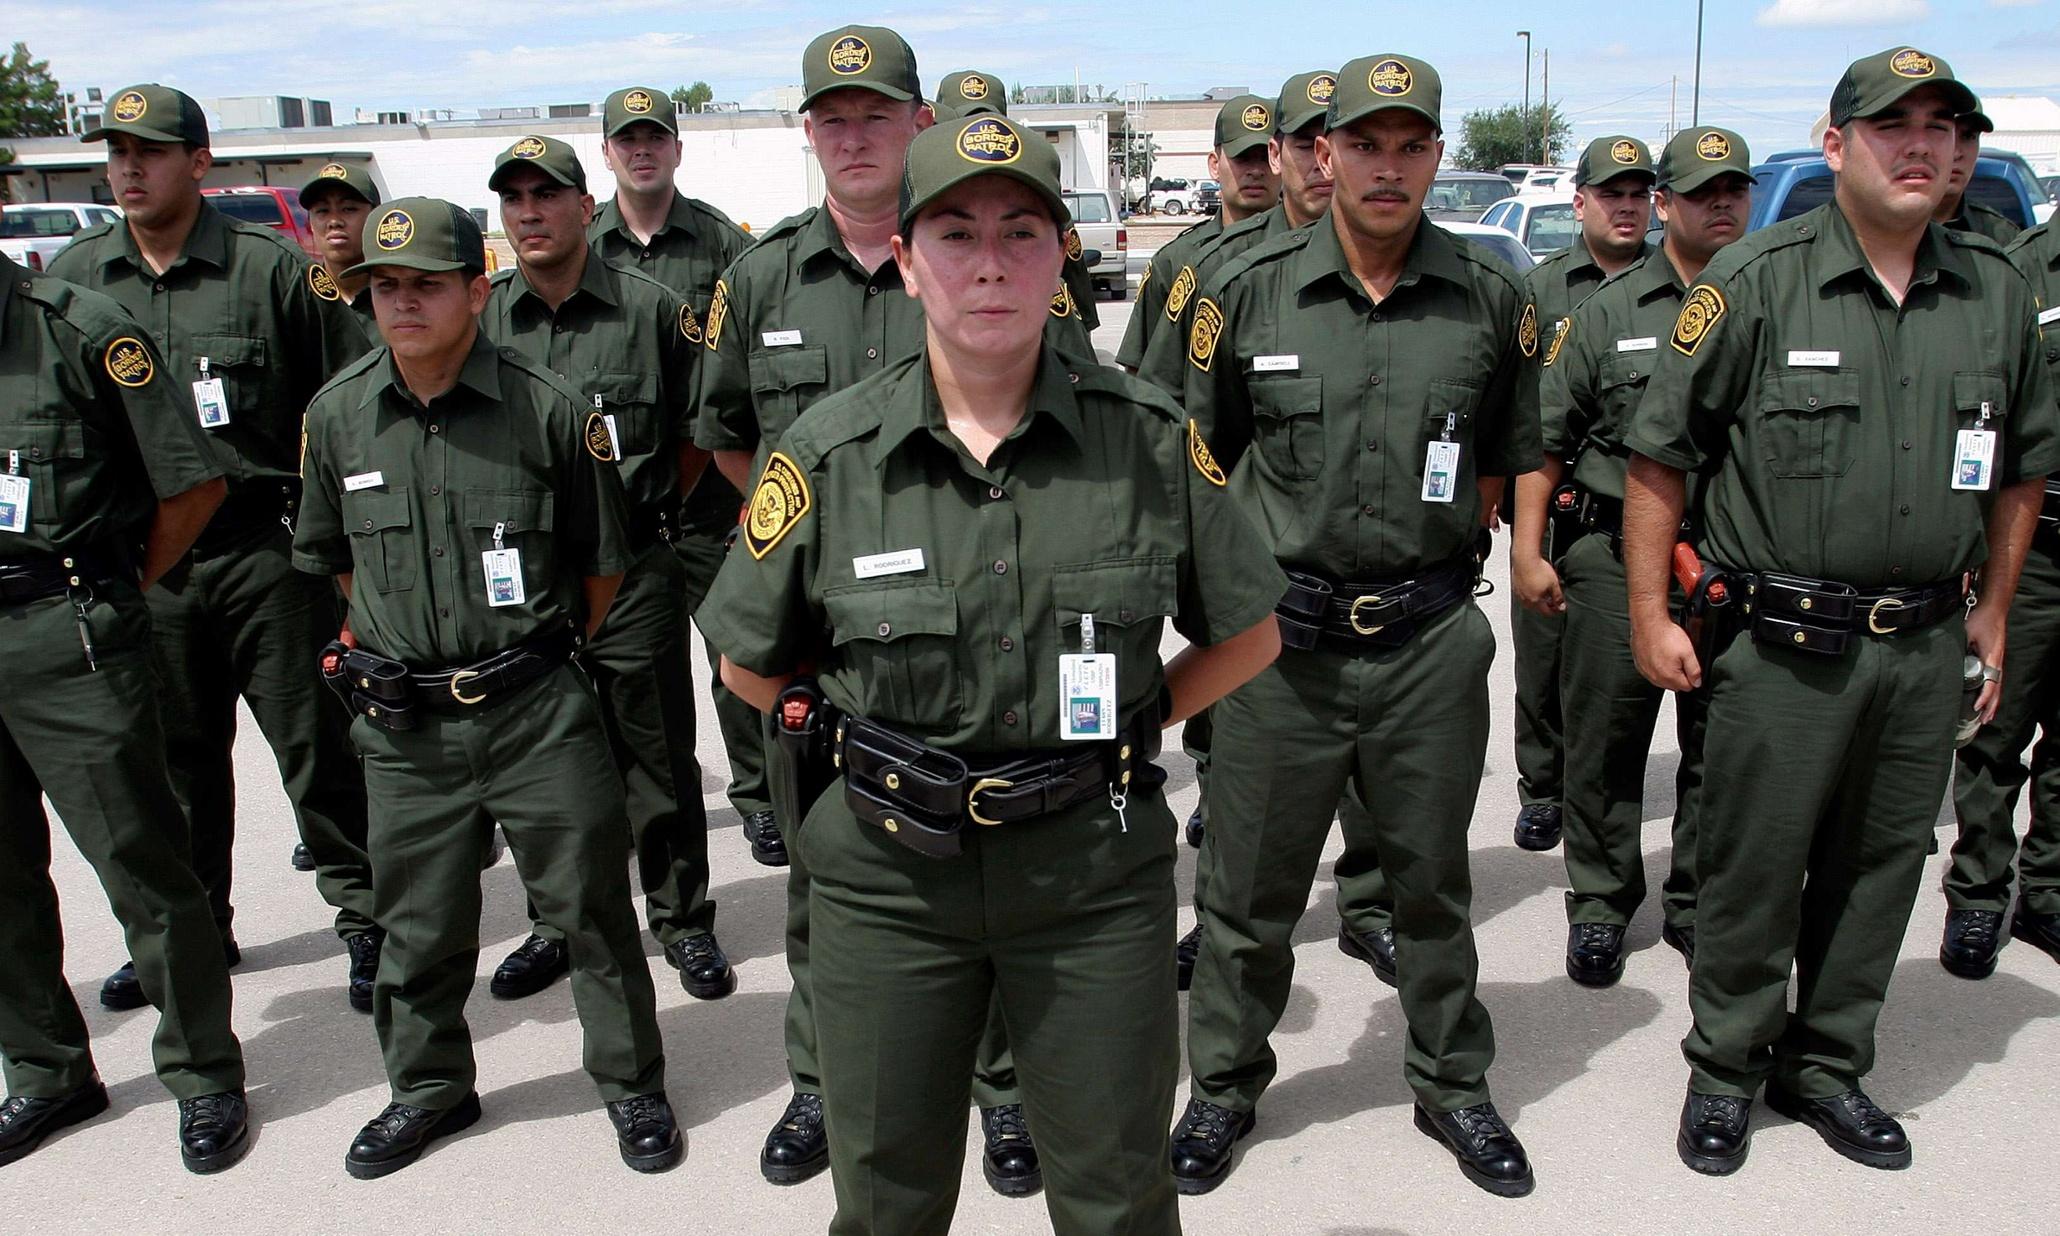 Dating a border patrol agent